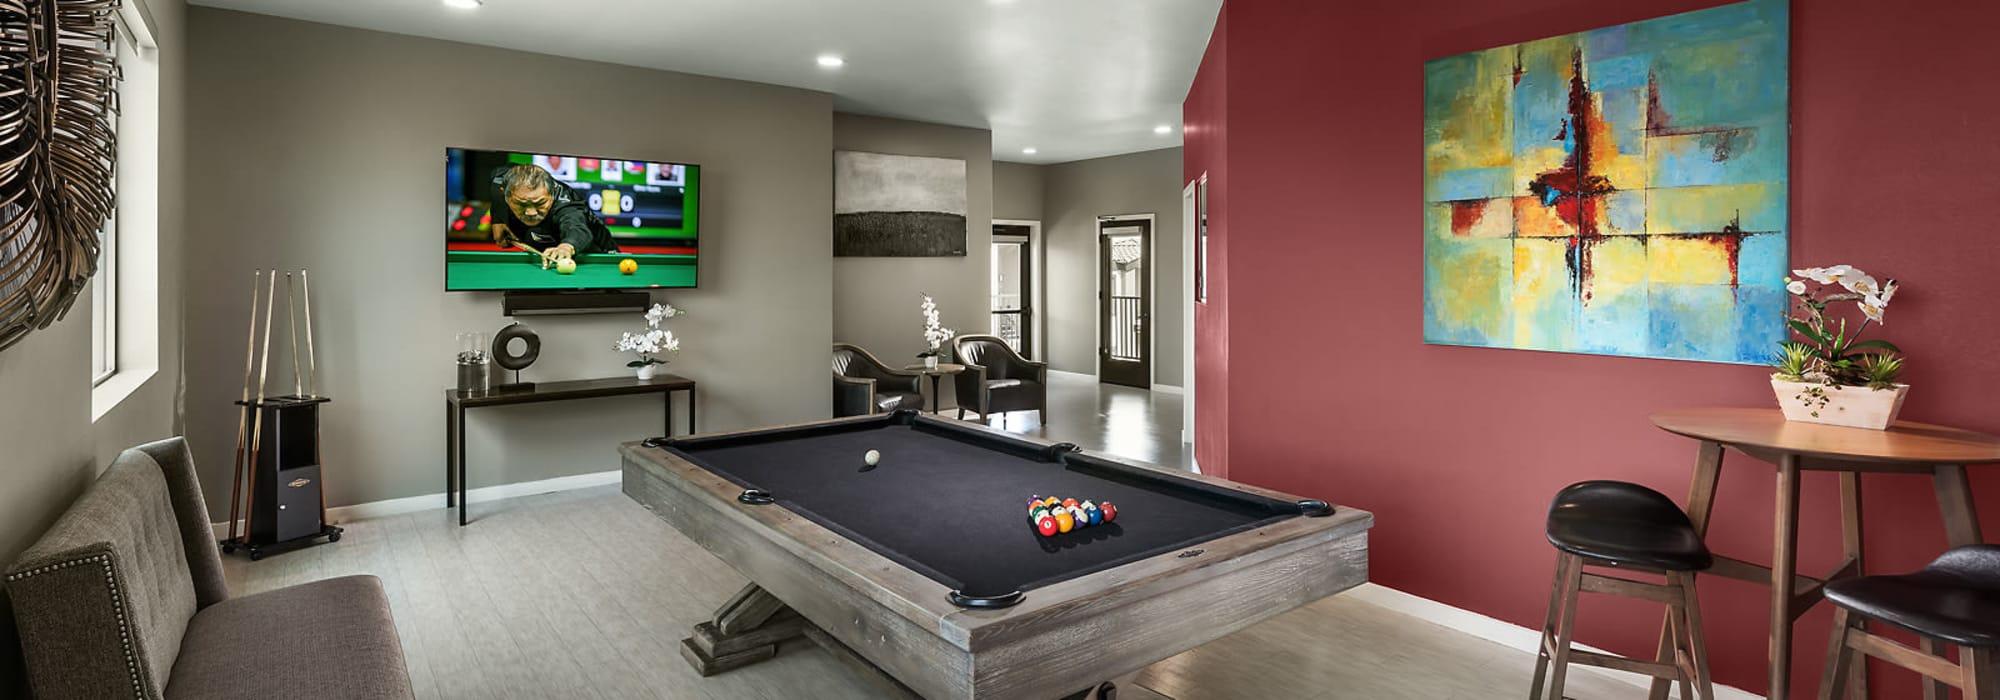 Billiards room at The Maxx 159 in Goodyear, Arizona